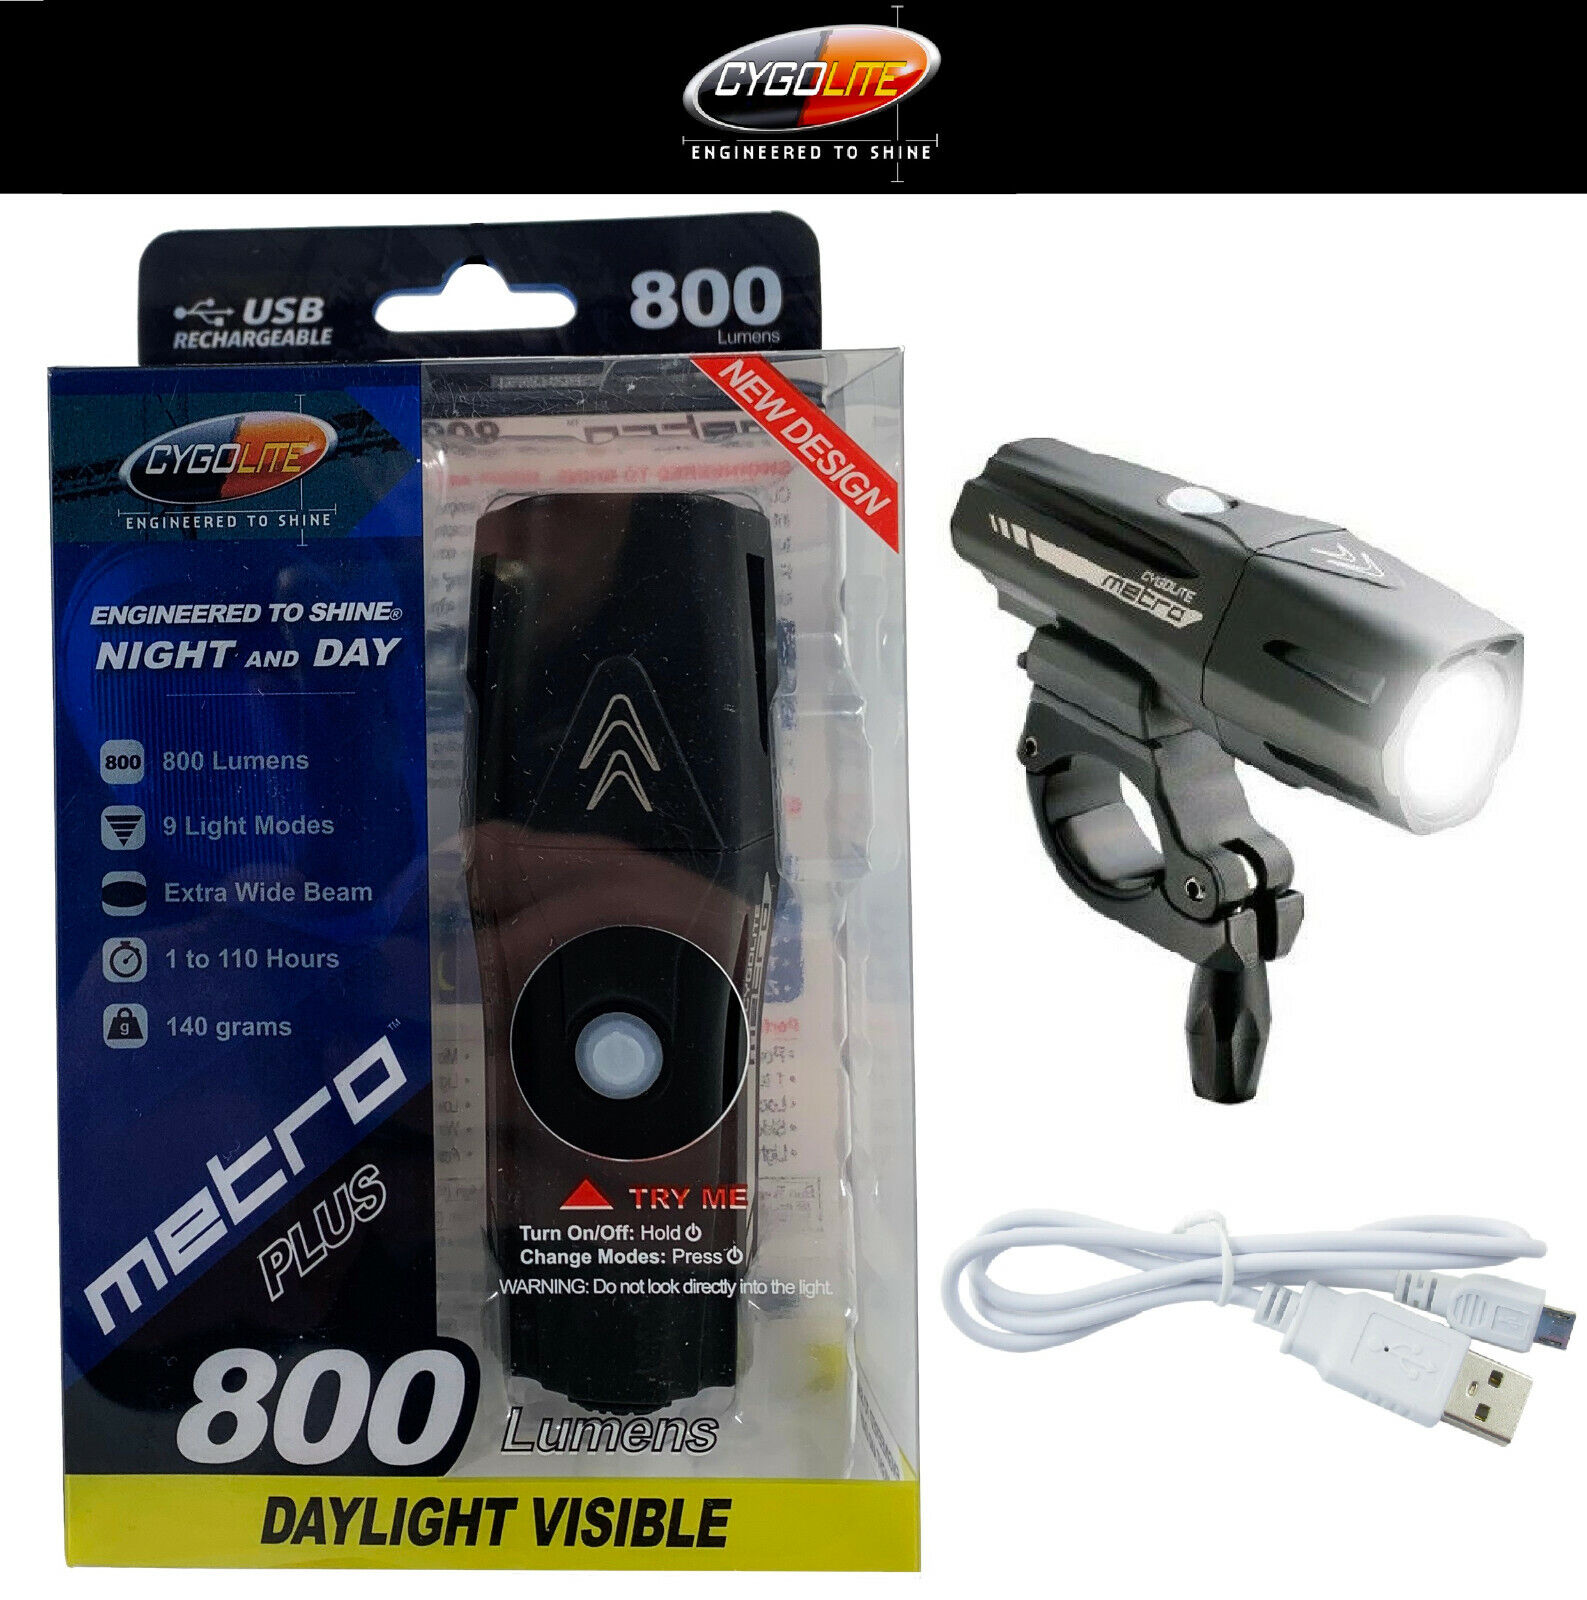 Cygolite Metro Plus 800 Lumens Headlight Bike Light USB Rech